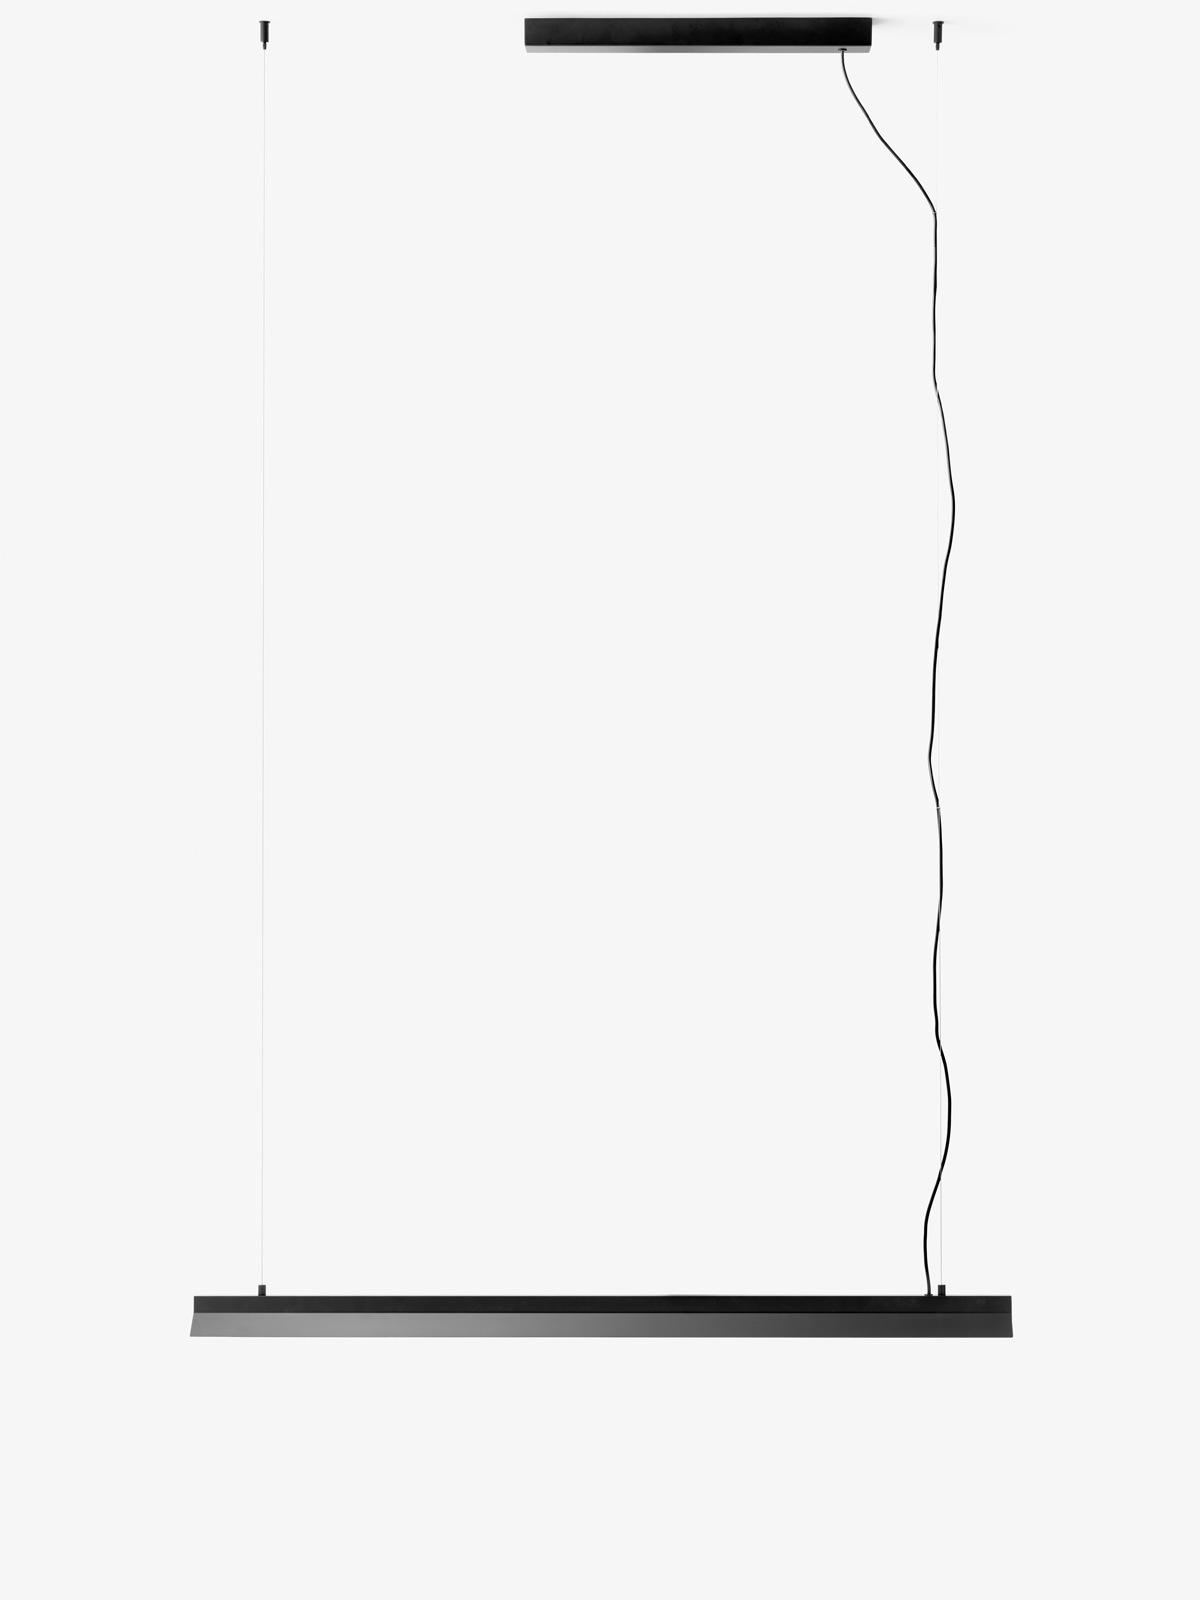 lange Pendelleuchte &tradition DesignOrt Onlineshop Lampen Berlin